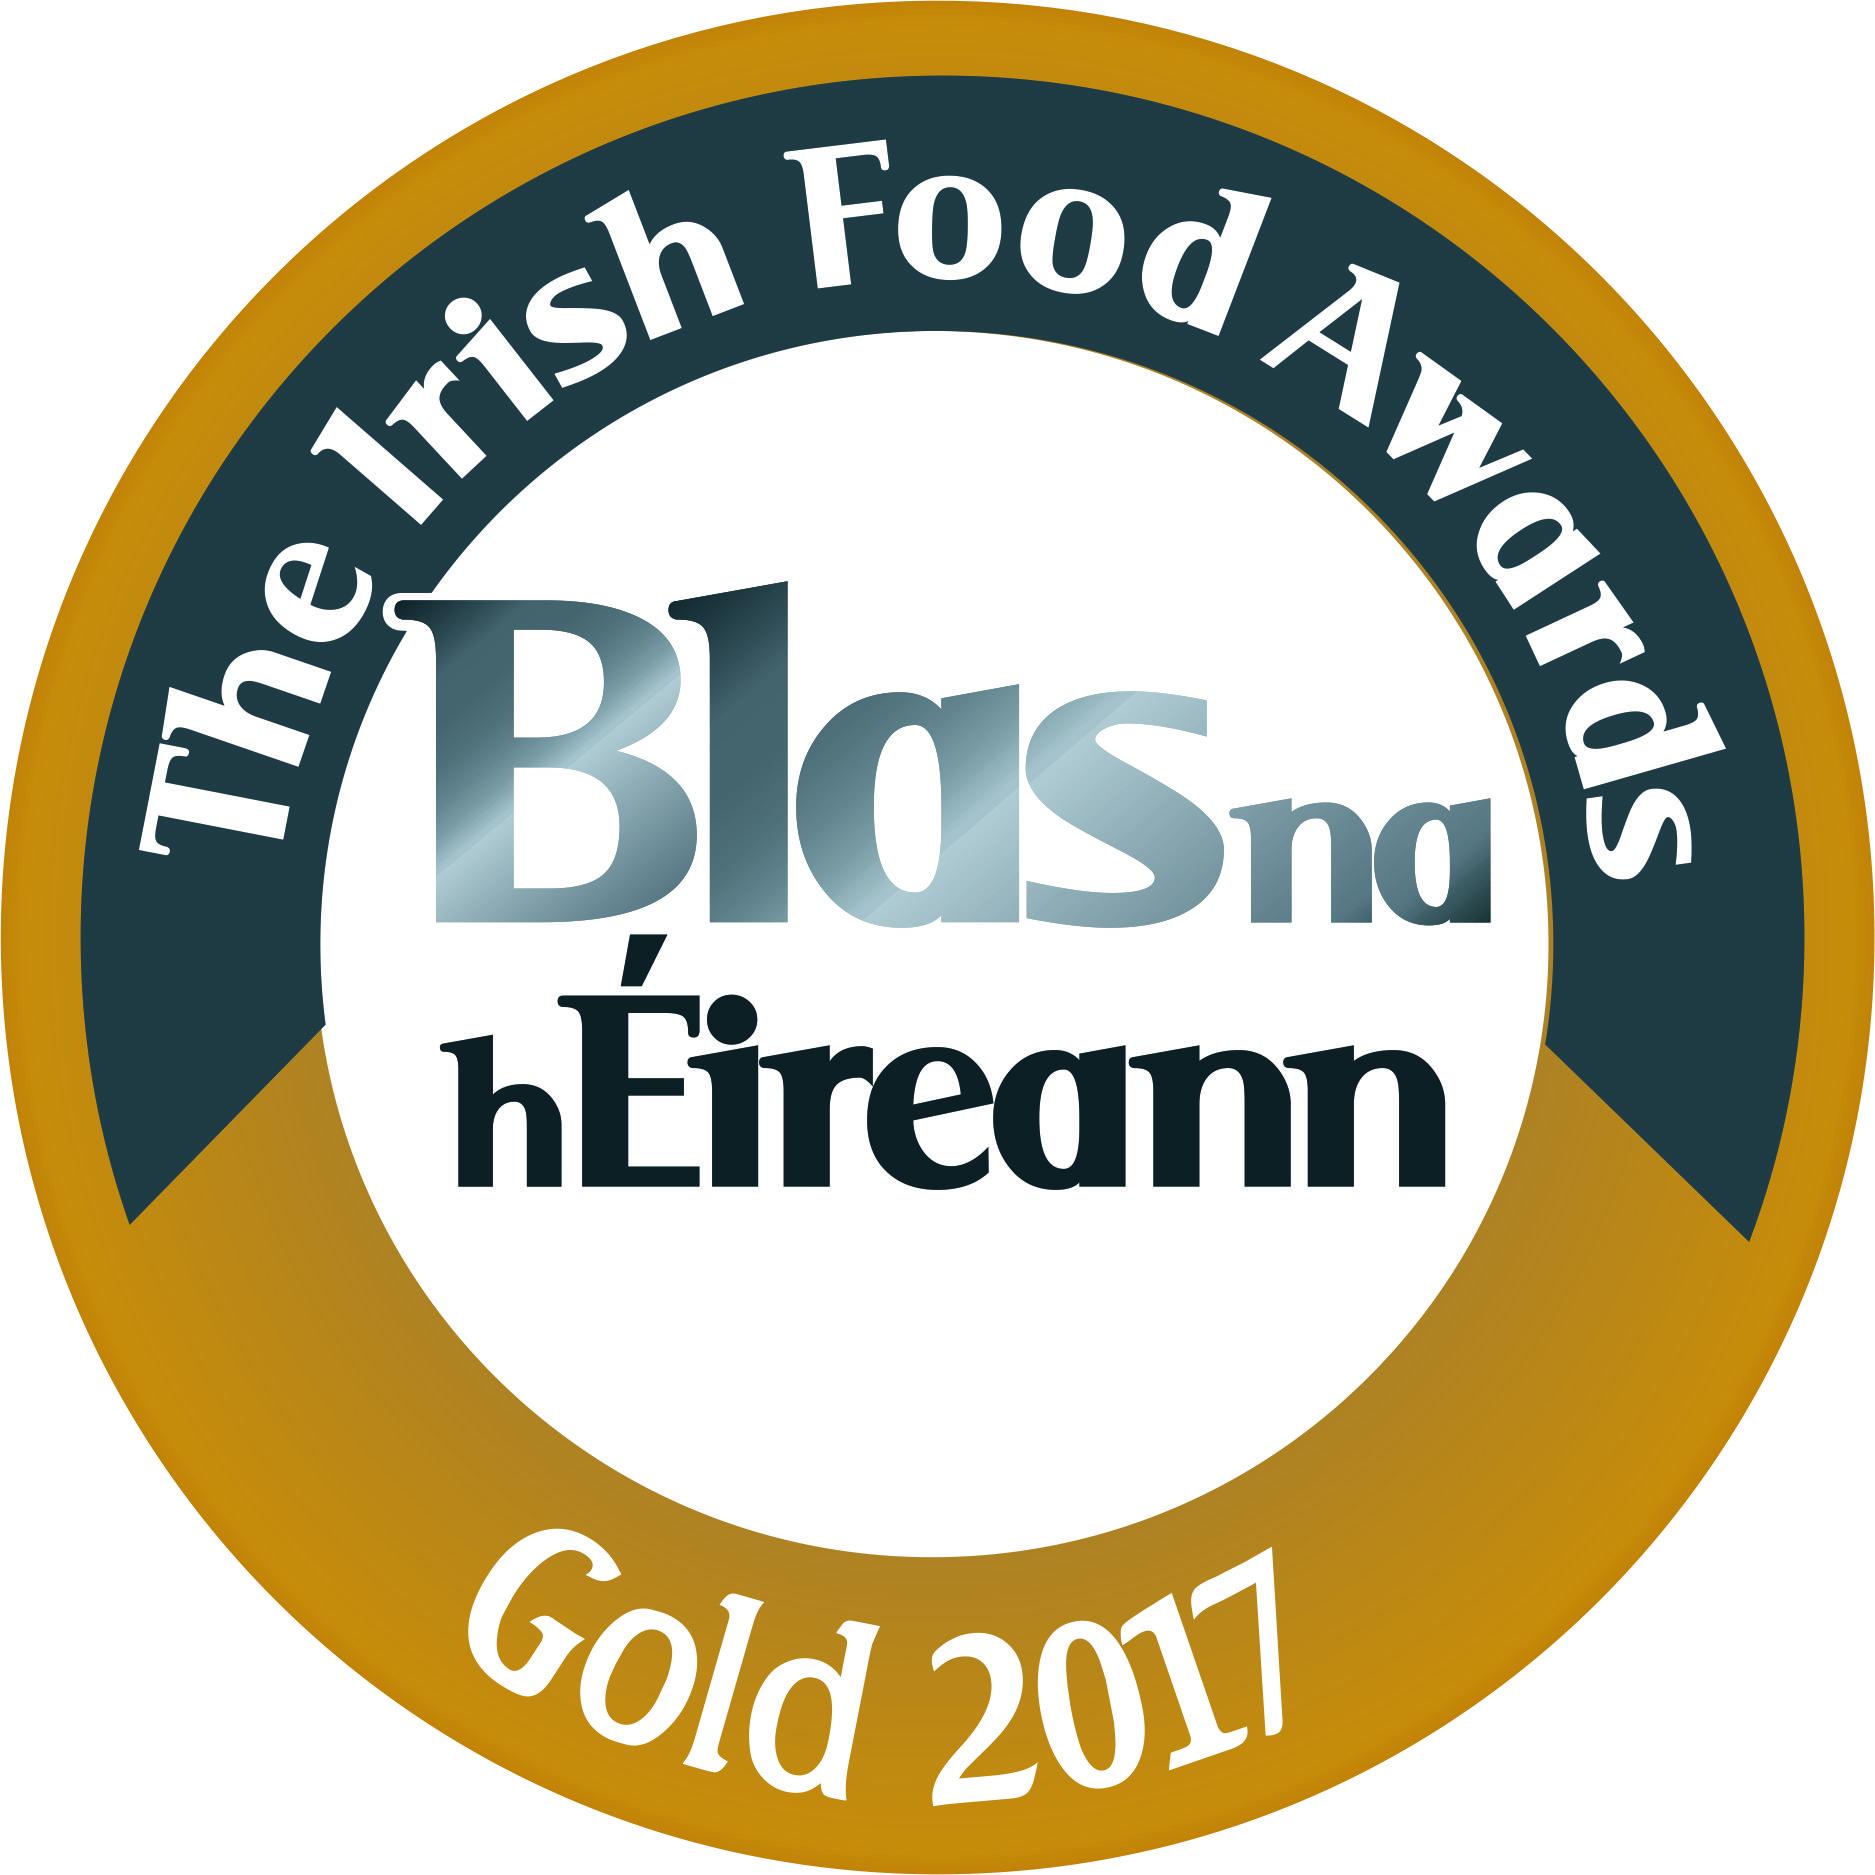 The Irish Food Awards – Gold 2017